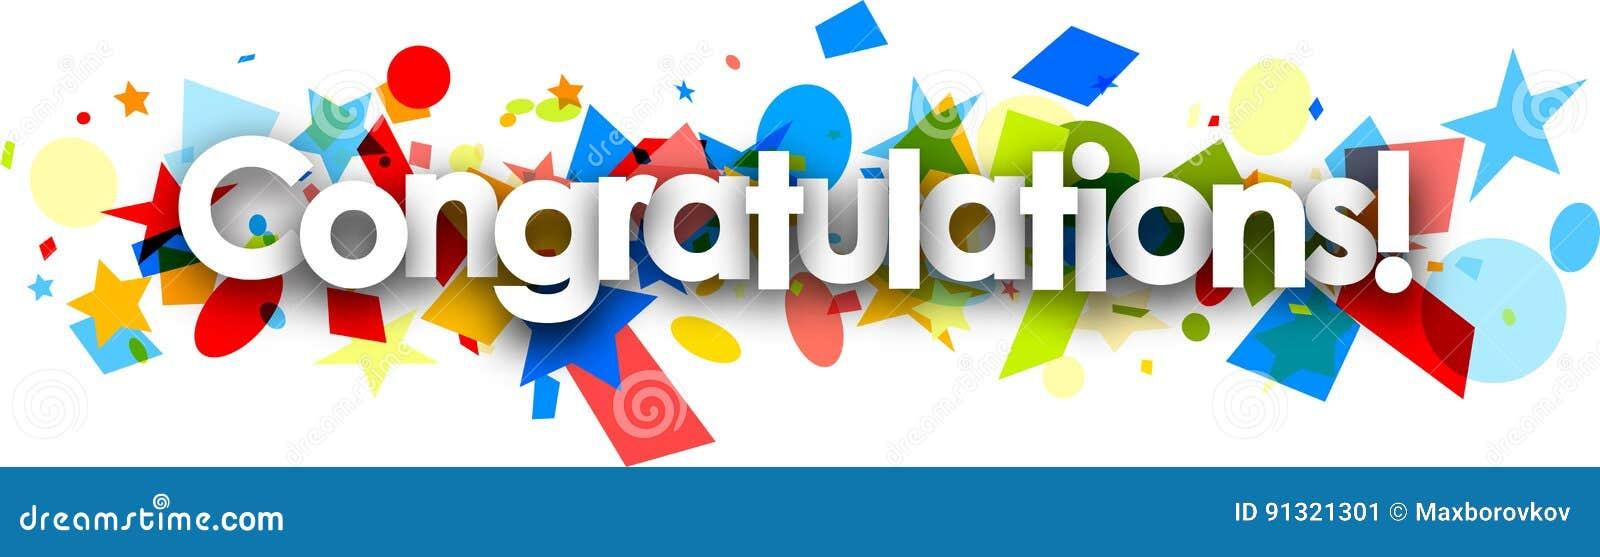 congratulations paper banner with confetti stock vector